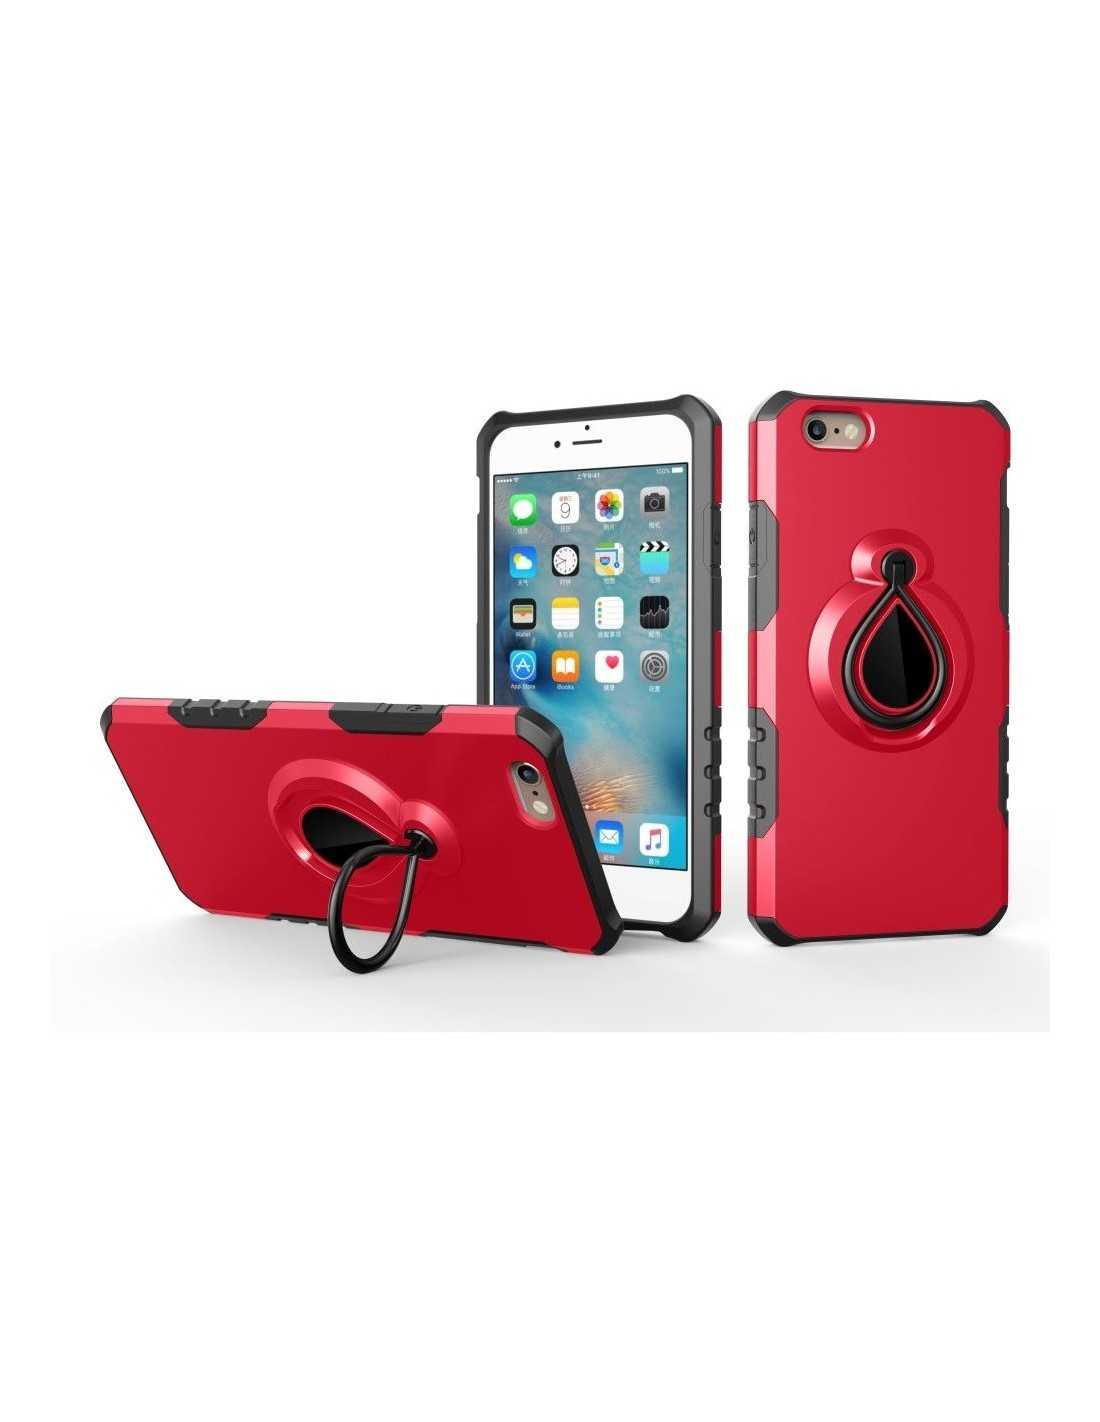 Coque iPhone 6 6s silicone et Metal avec anneau - All4iphone